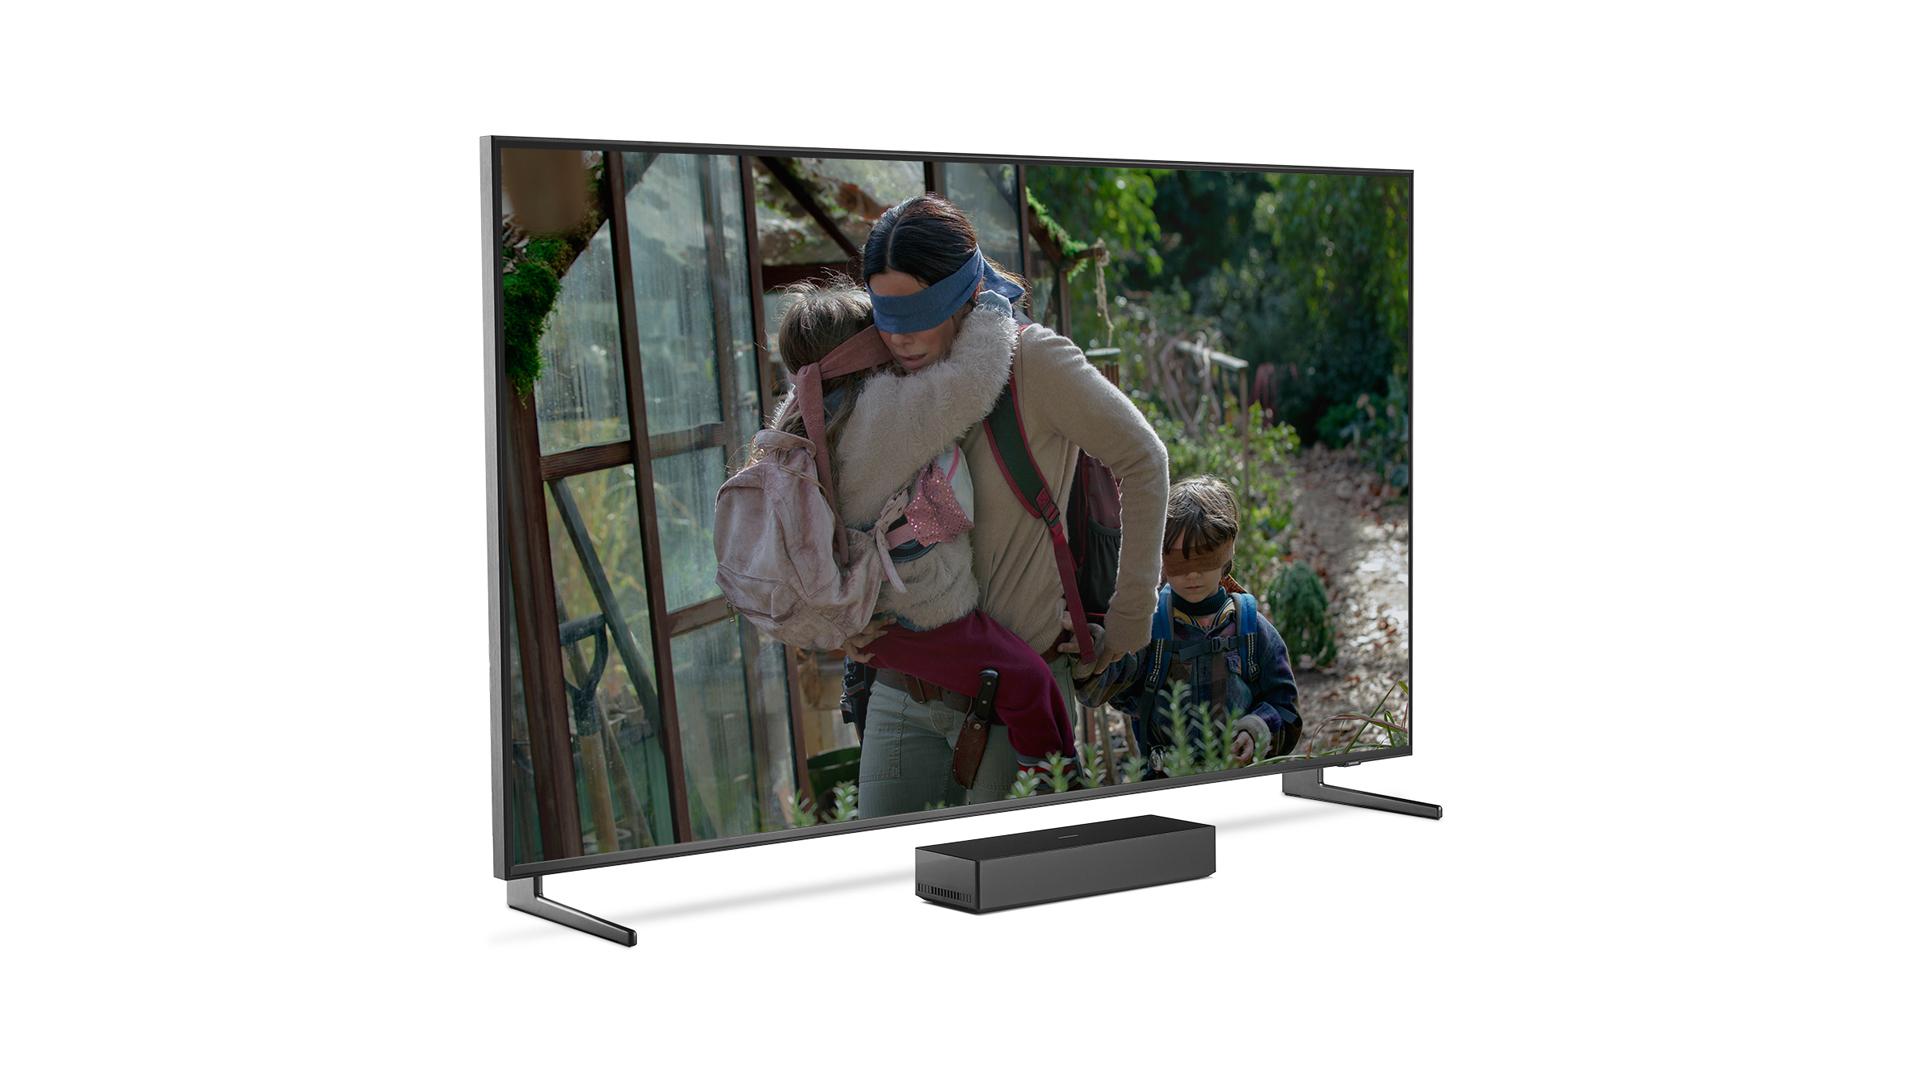 Samsung QE65Q900R 8K QLED TV review | What Hi-Fi?